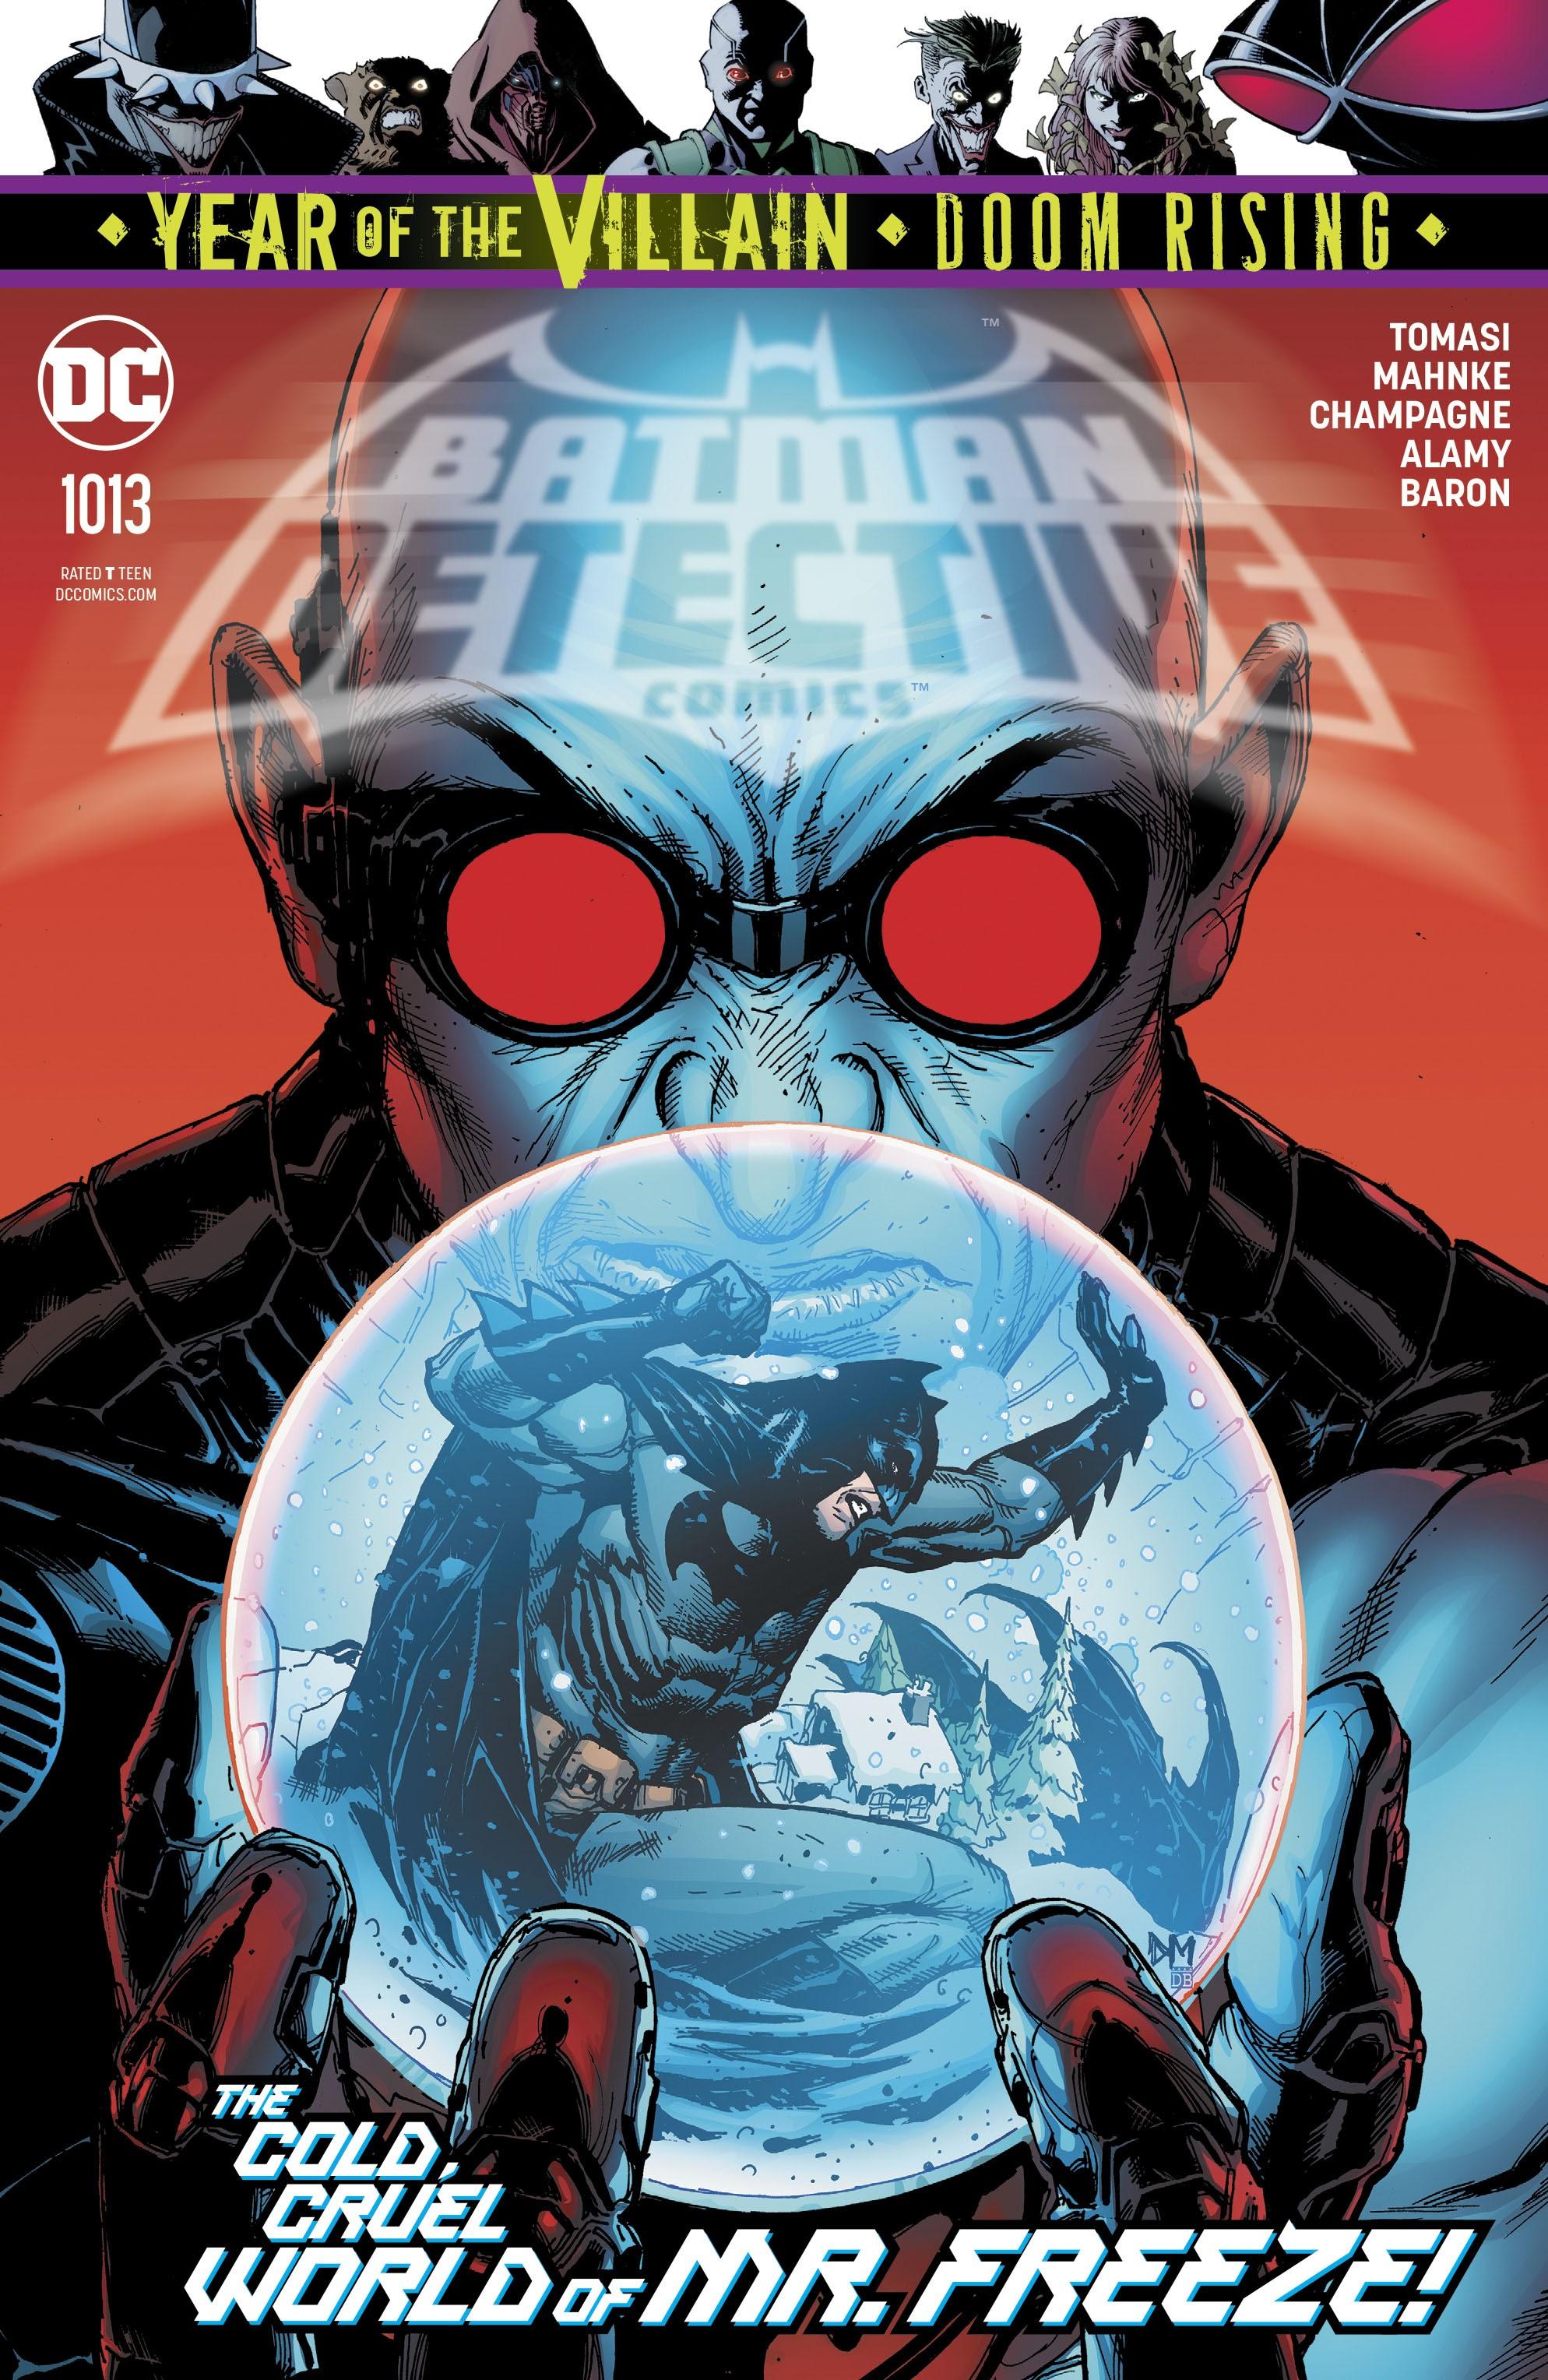 Detective Comics (2016) 1013 Page 1